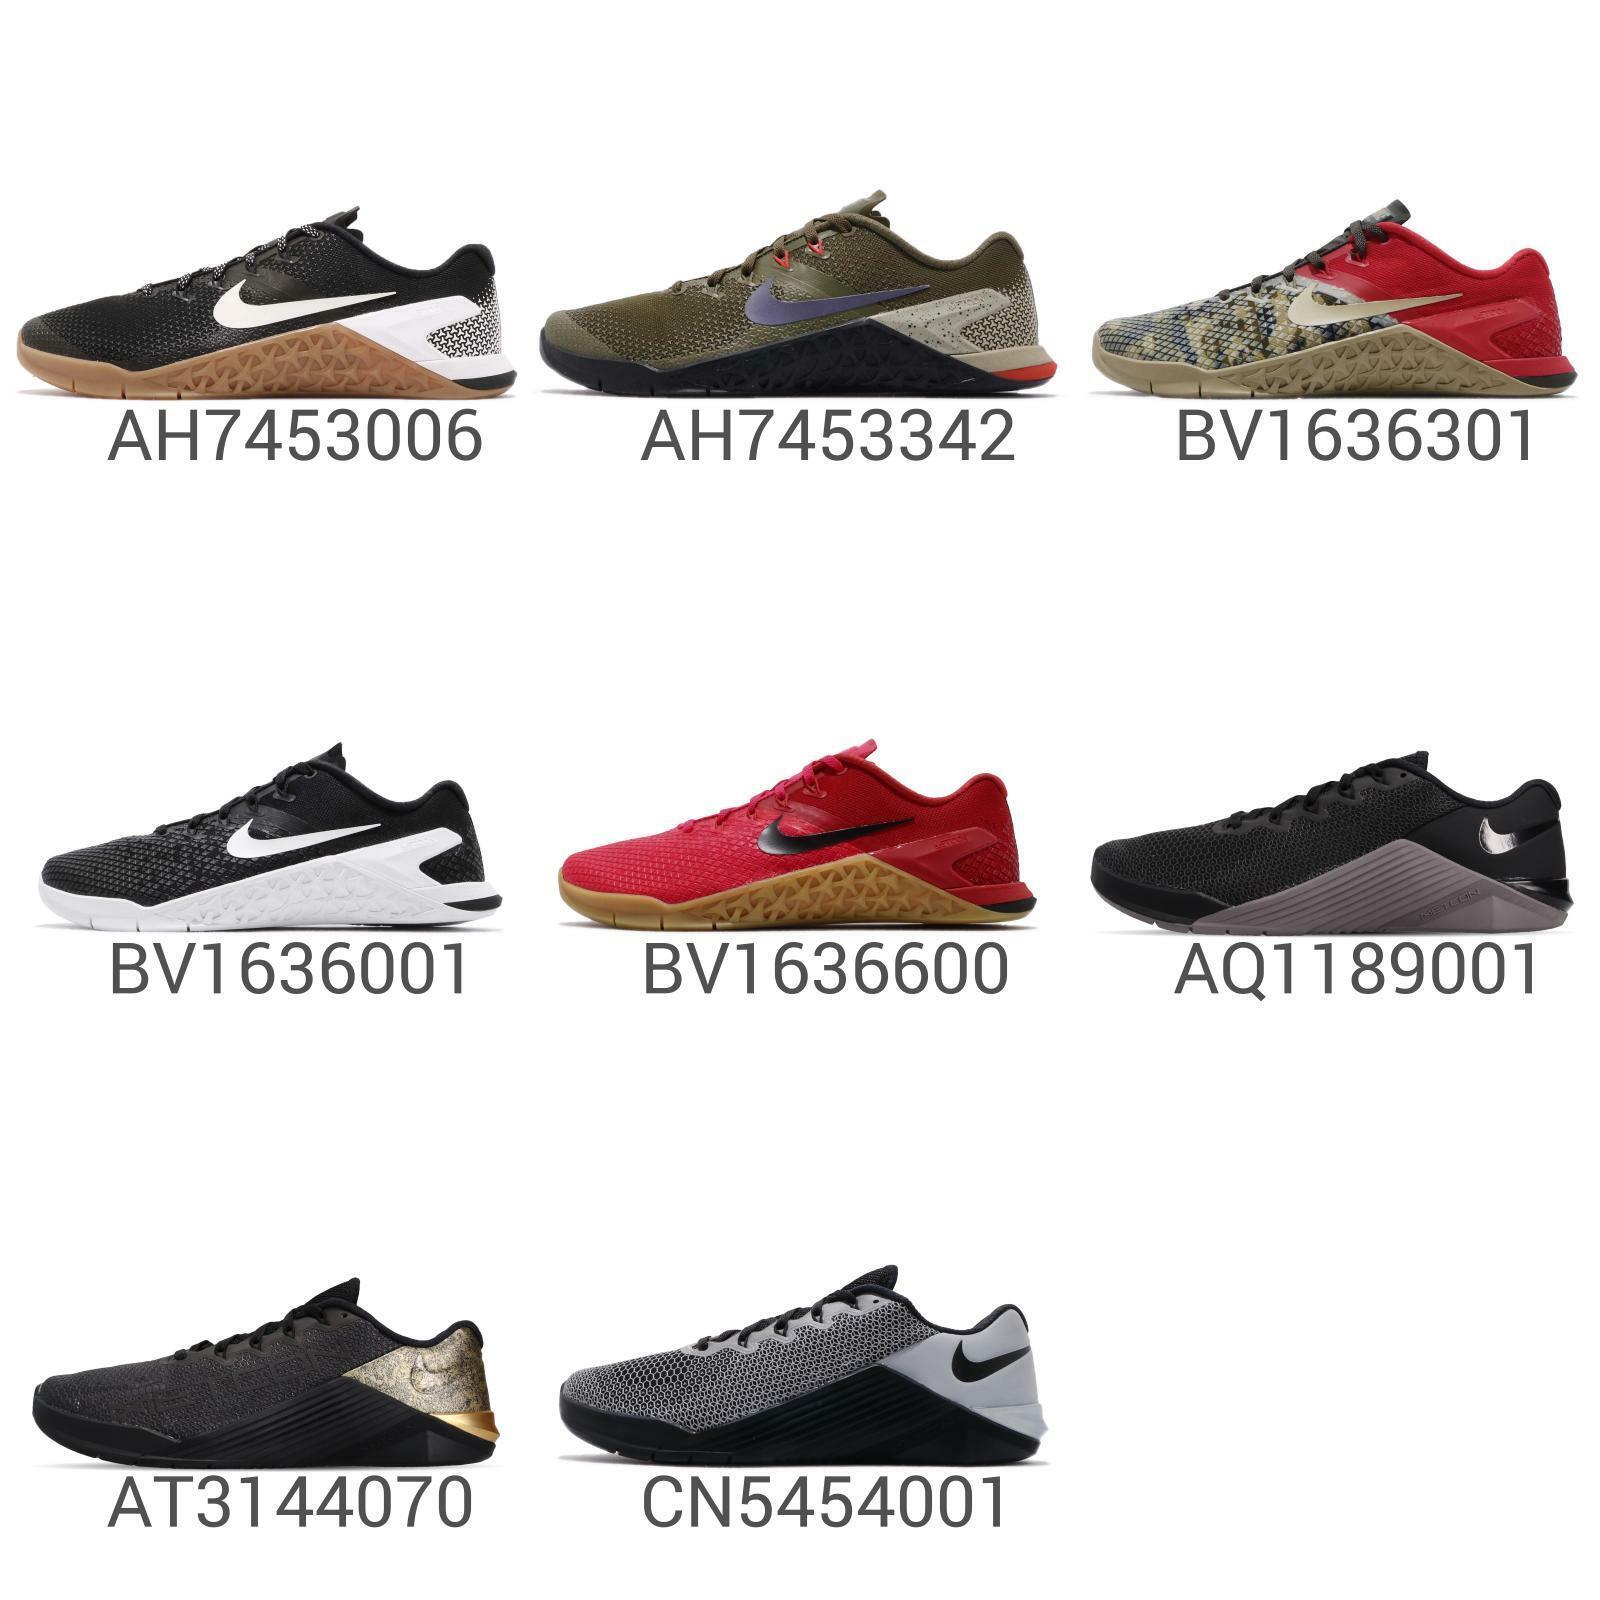 Nike AH7453-001: MEN's Metcon 4 Black